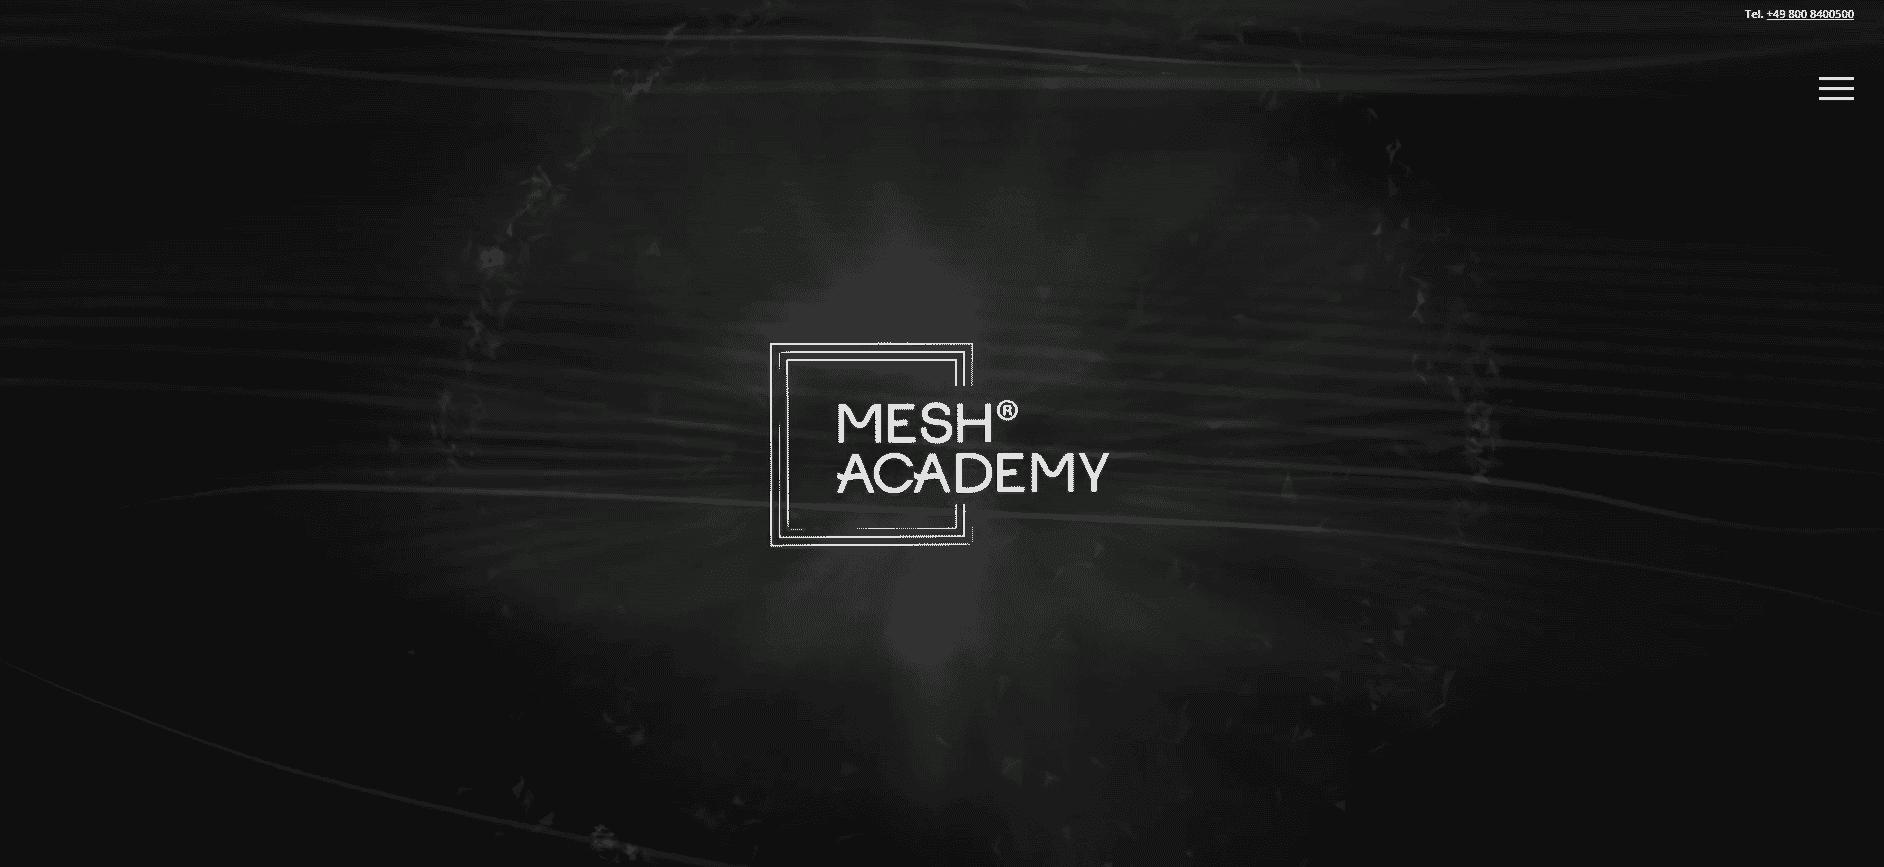 mesh academy